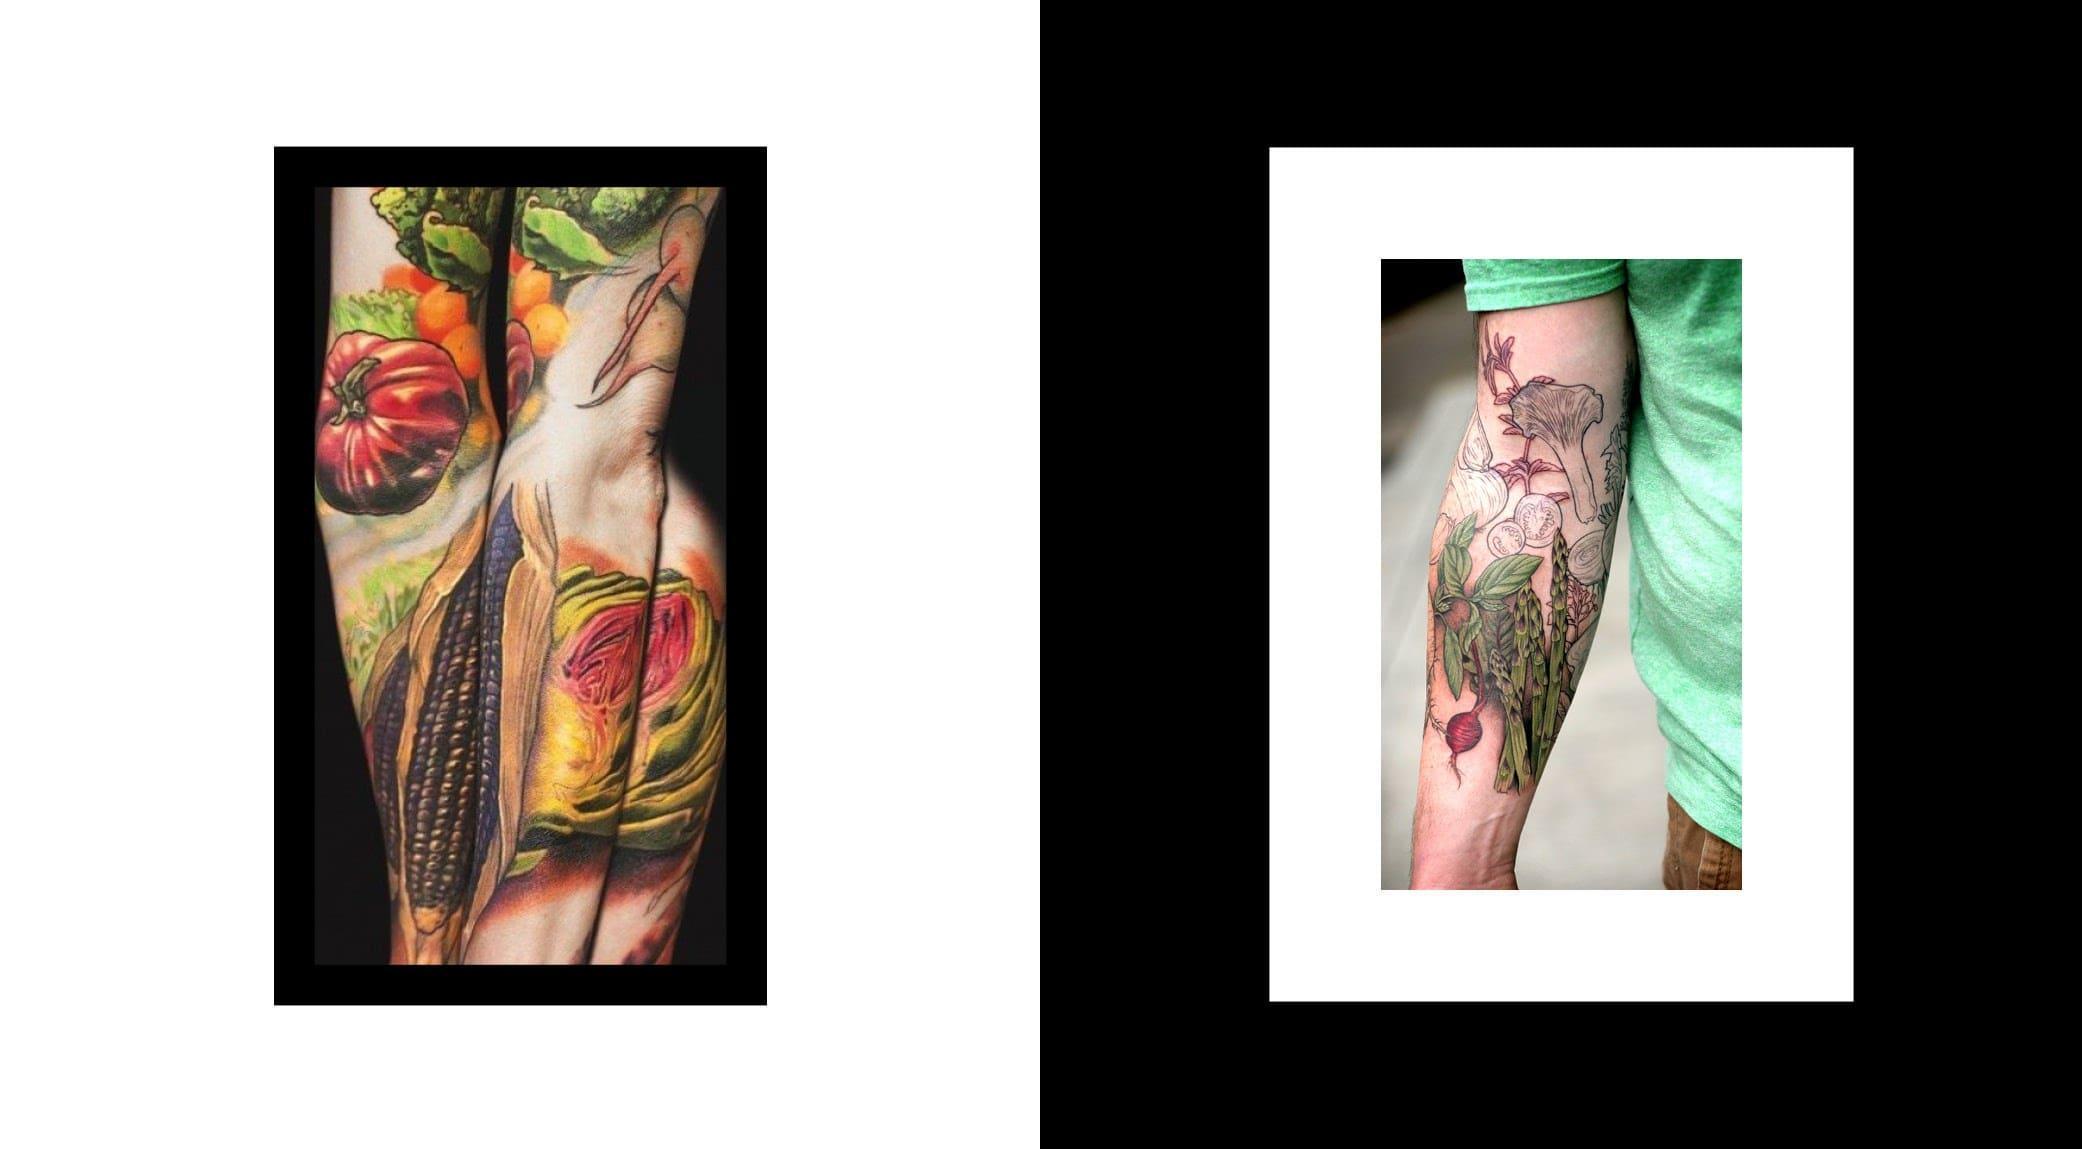 original_014-tattoo-finedininglovers14.jpg